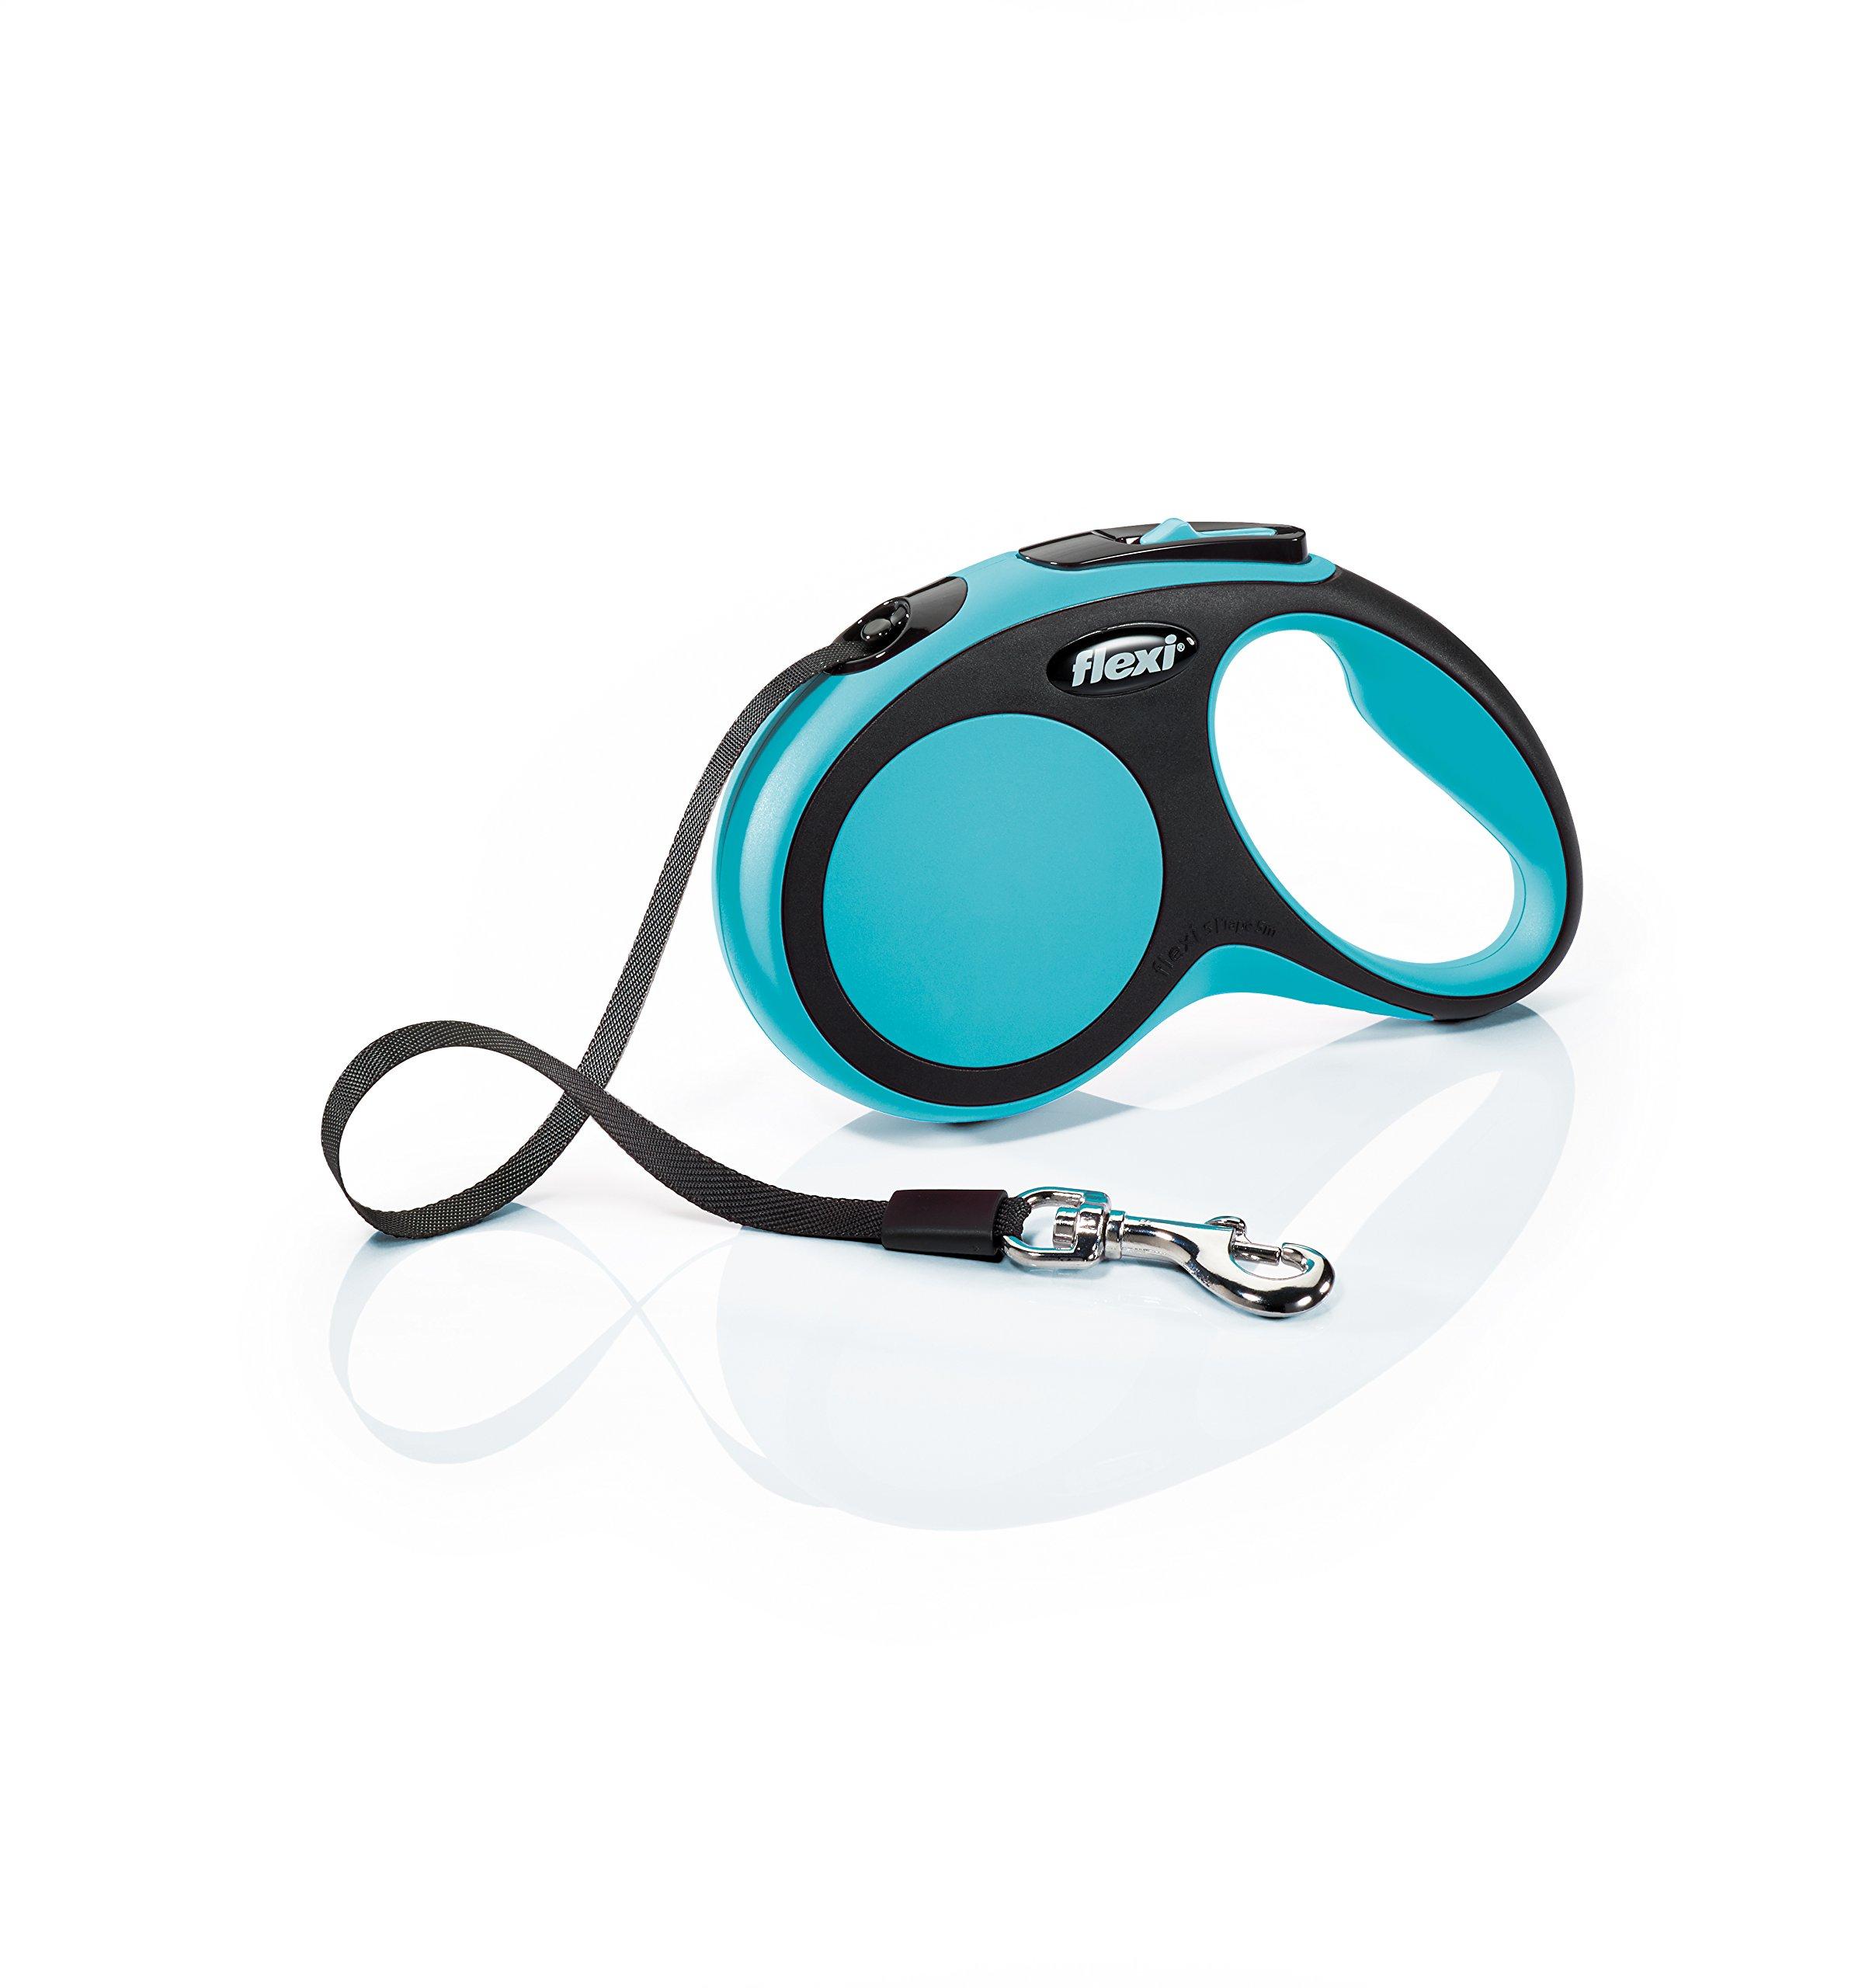 Flexi New Comfort Retractable Dog Leash (Tape), 16 ft, Small, Blue